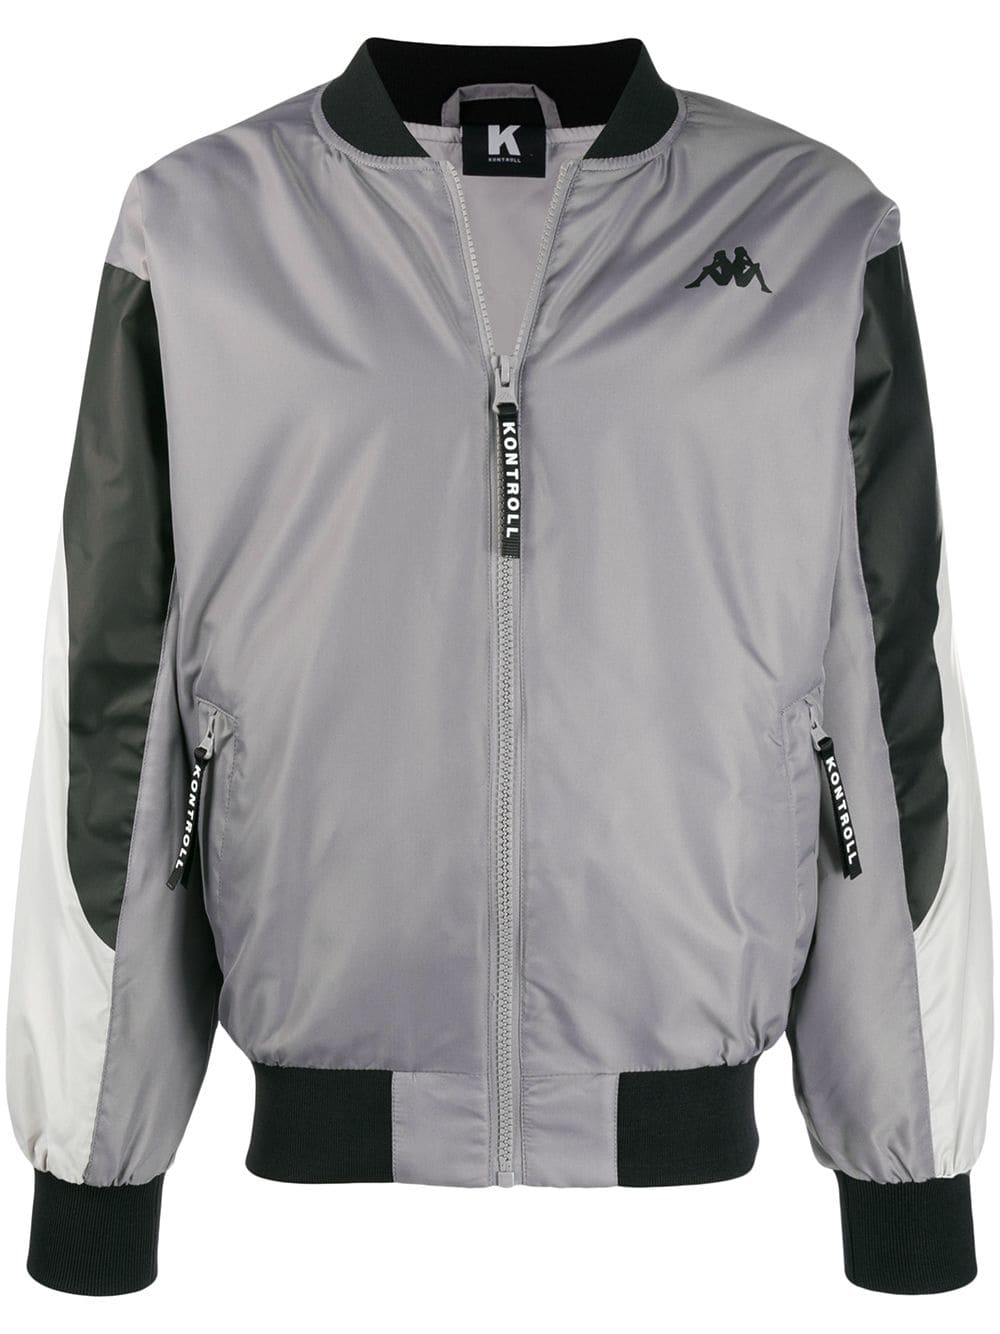 Kappa Kappa Kontroll Klassische Sportjacke Grau Kappa Cloth Jackets Sports Jacket Gray Jacket [ 1334 x 1000 Pixel ]